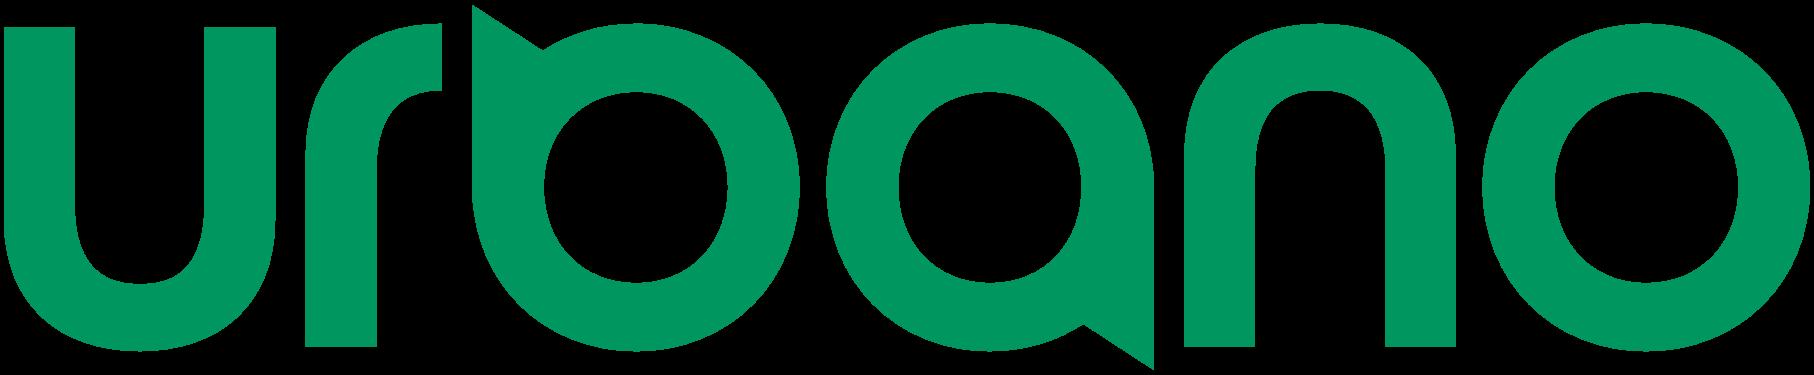 Urbano logo.png